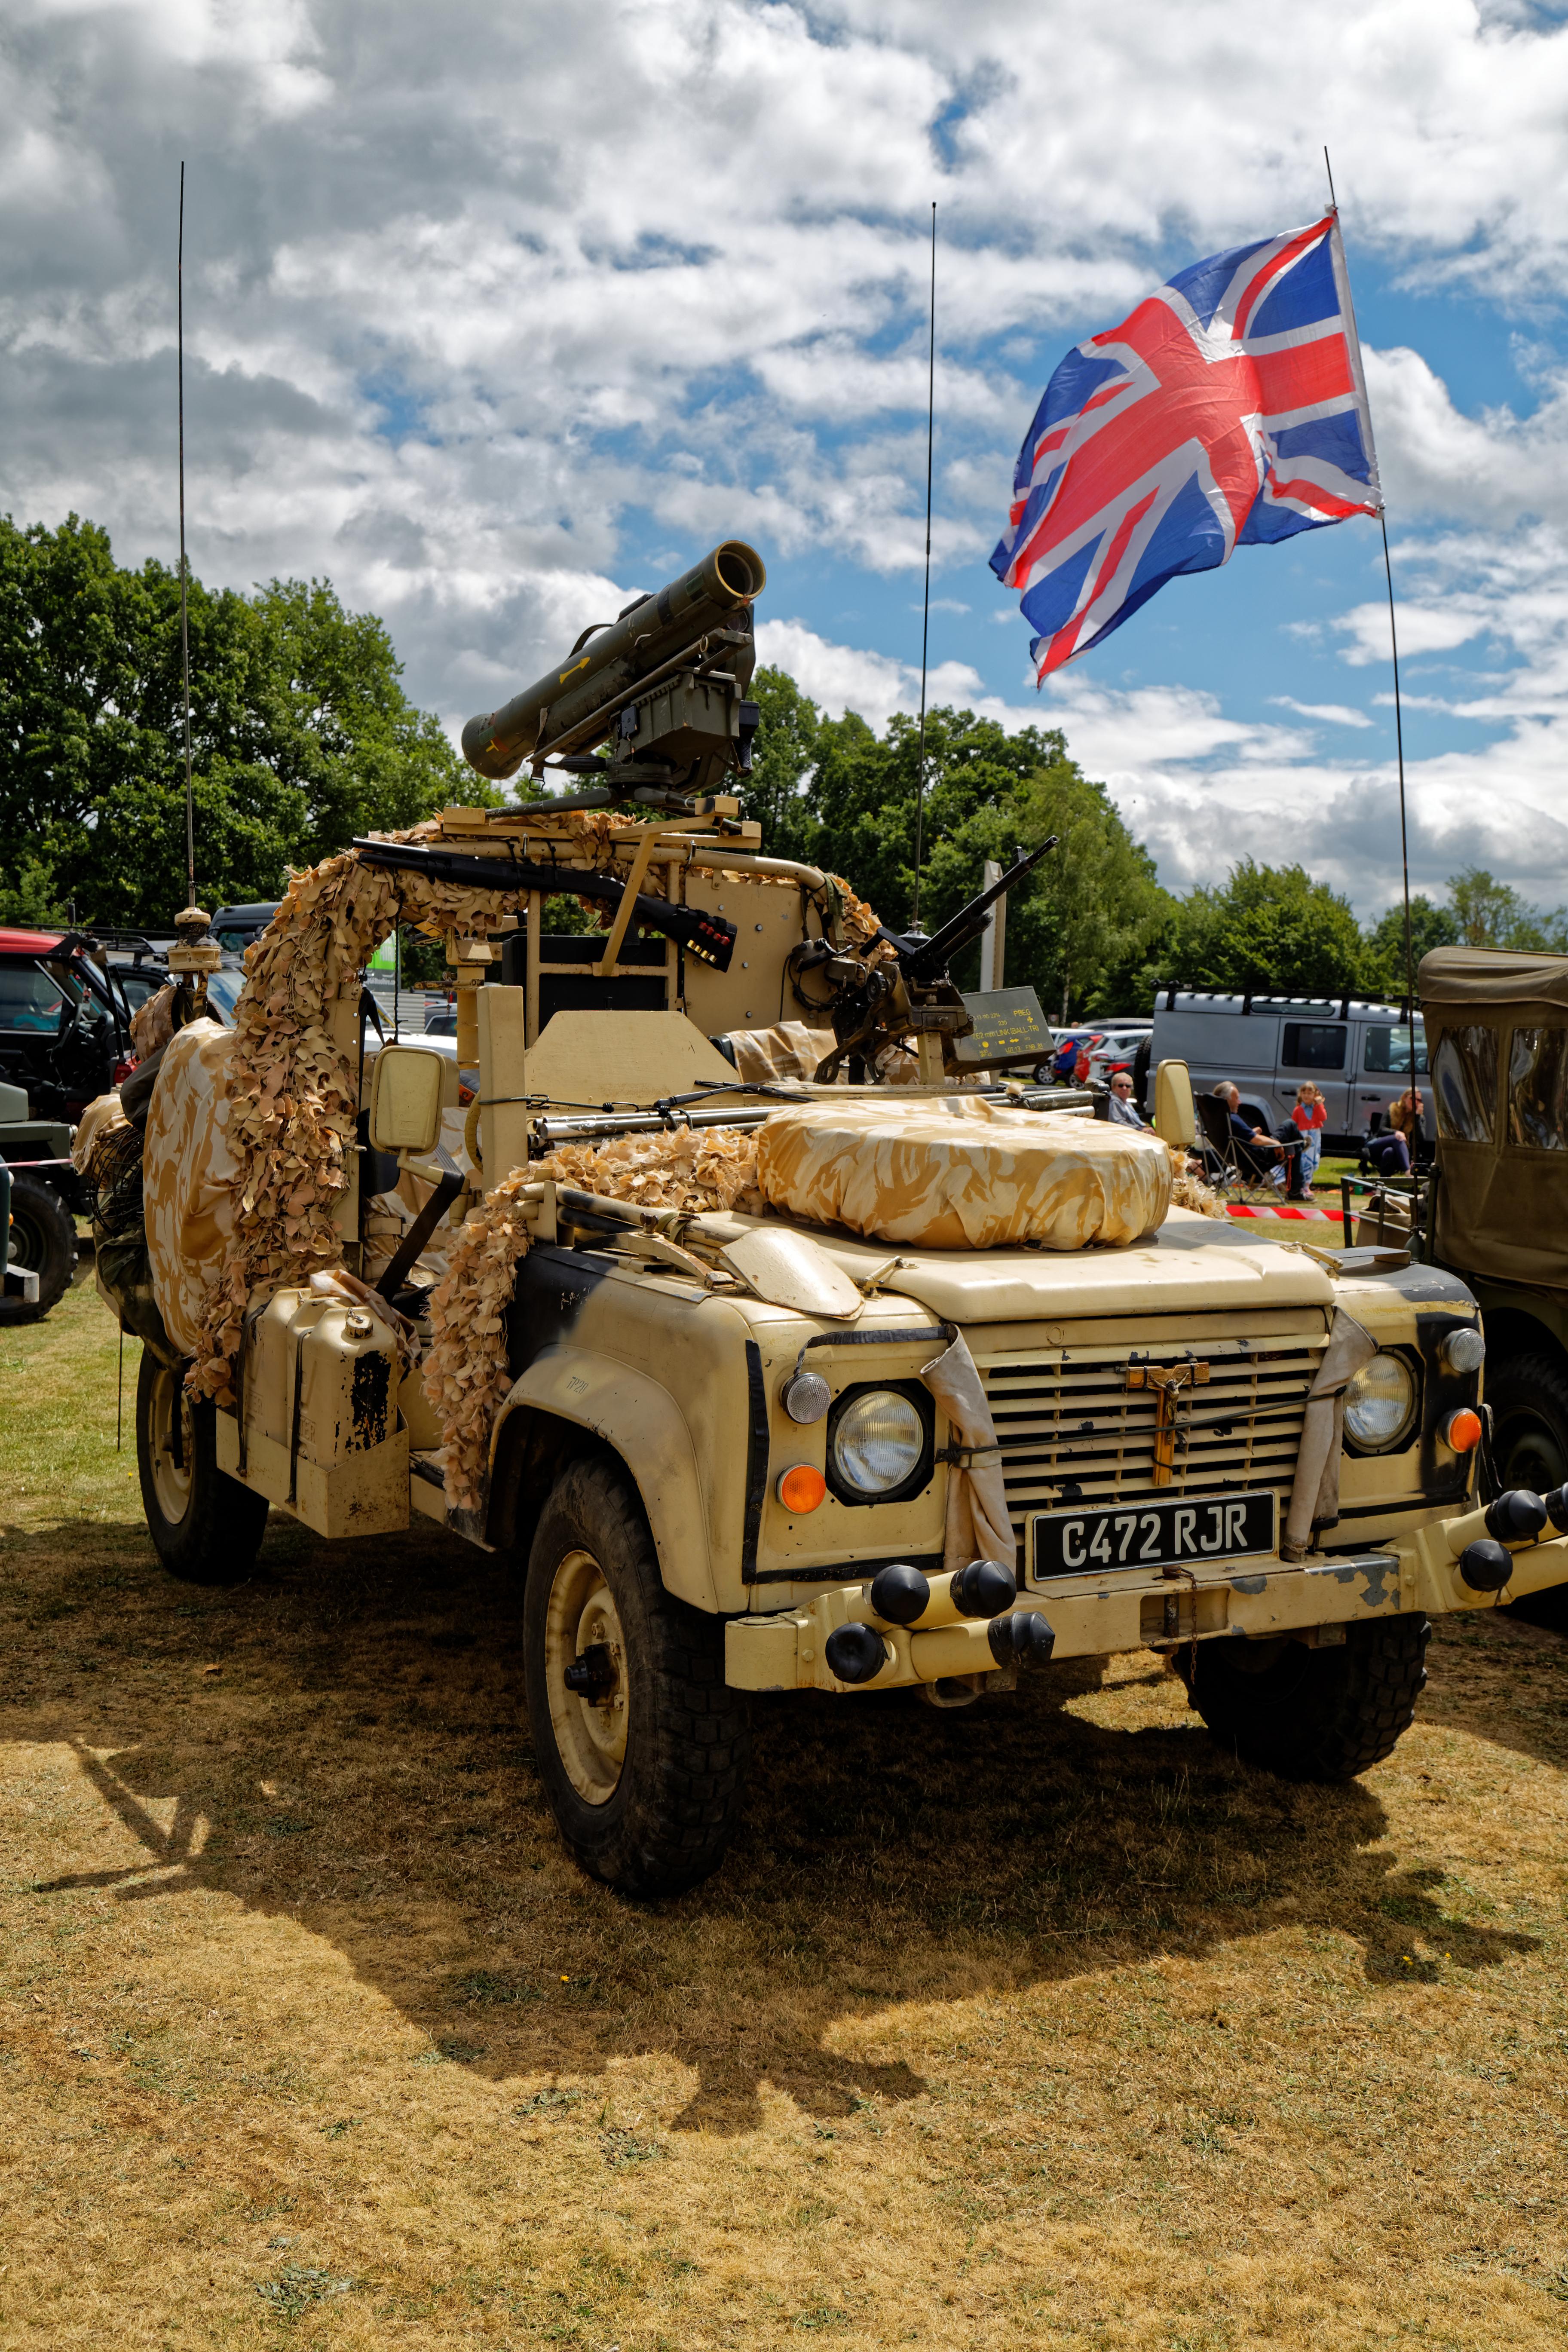 file:1985 land rover 2495cc at hatfield heath festival 2017